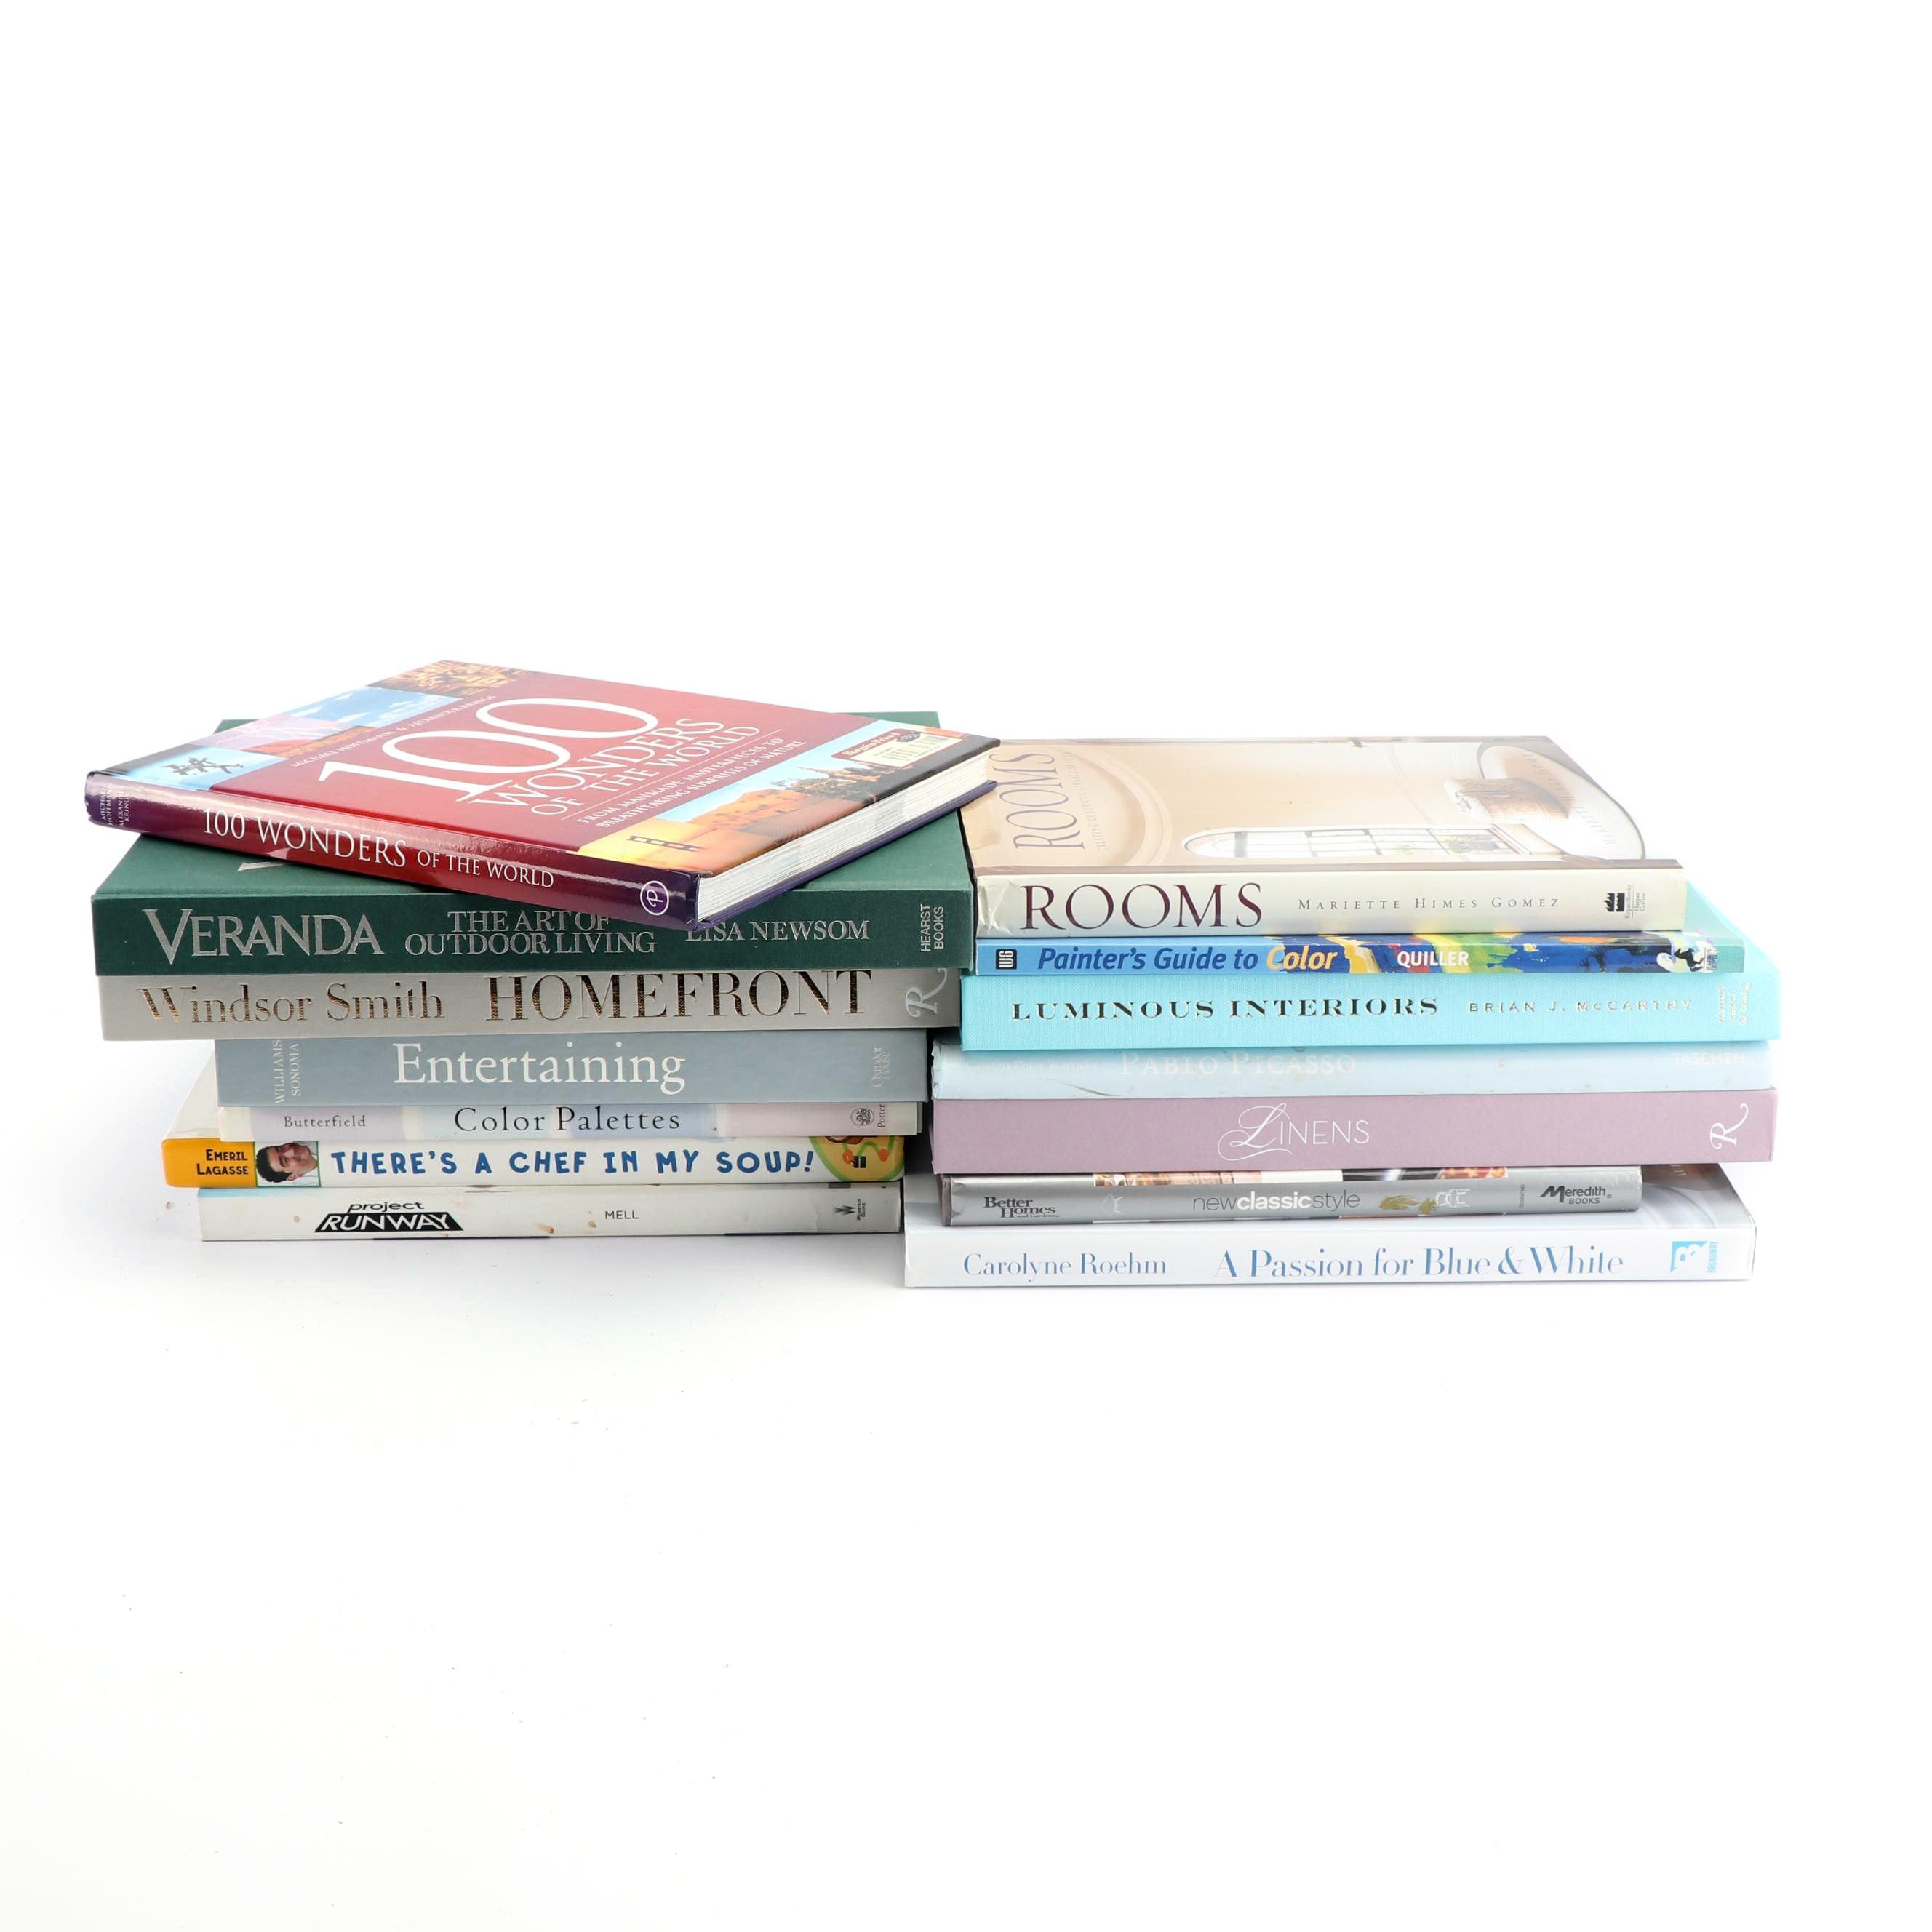 Books including Art, Decor and Entertaining